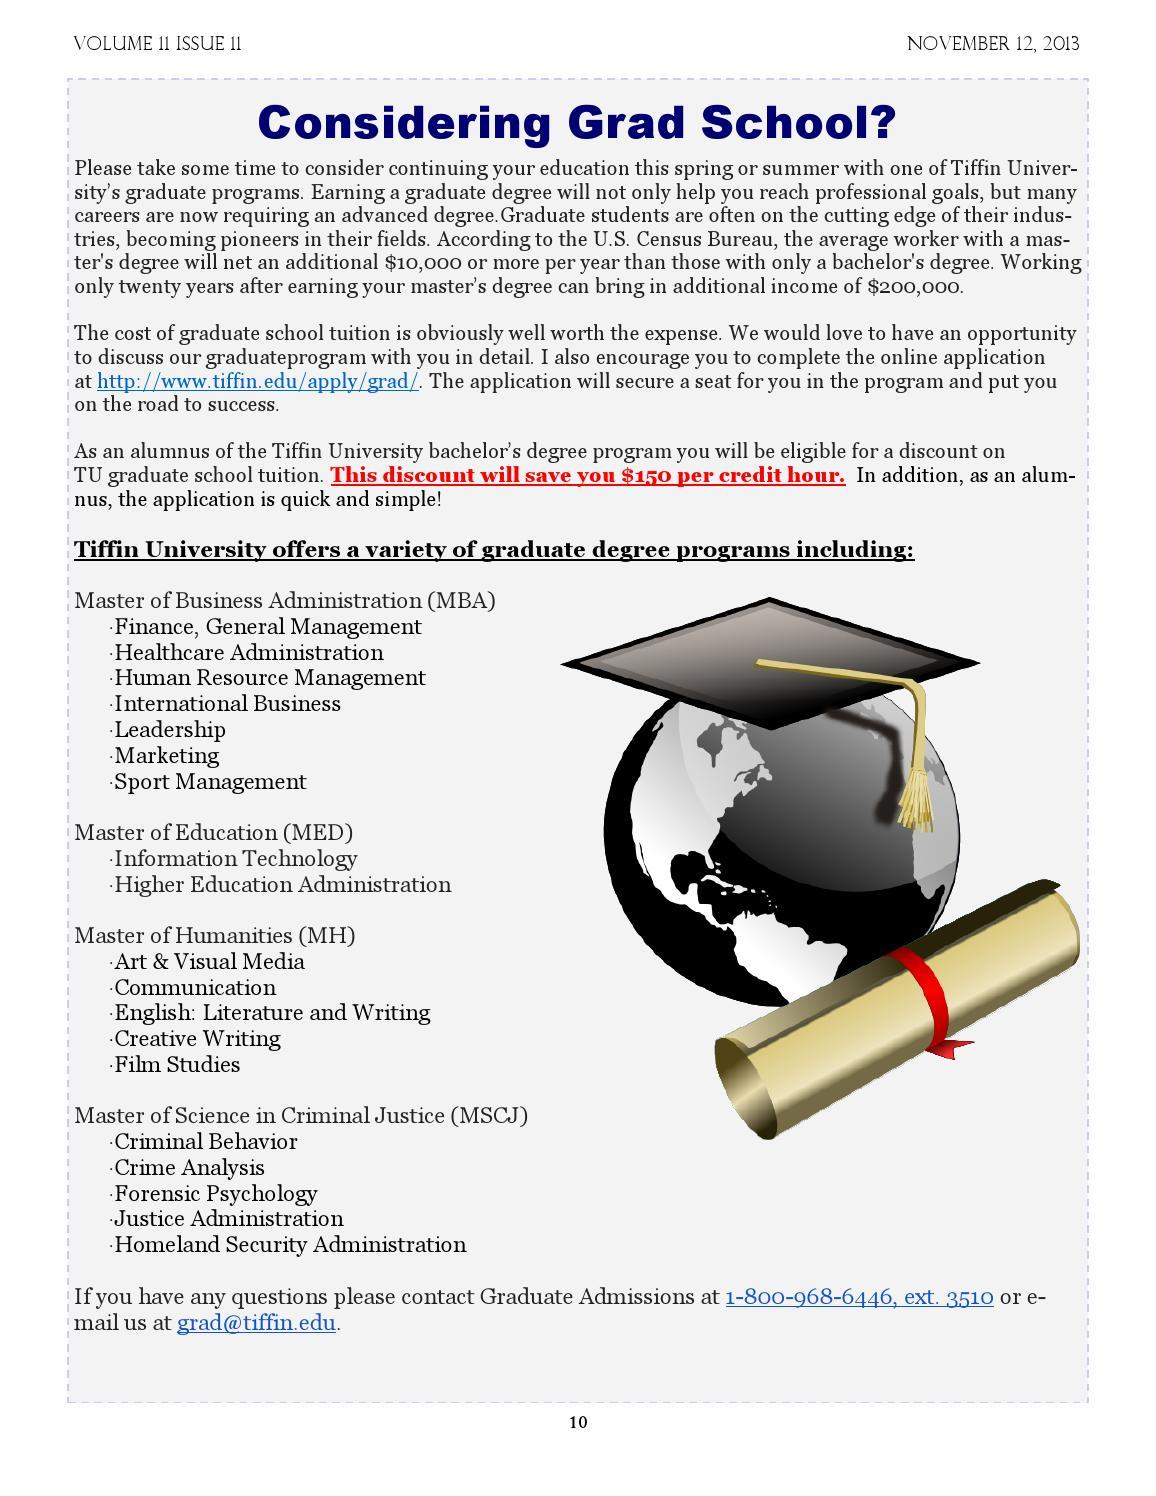 Dragon News (11/12/2013) by Tiffin University - issuu